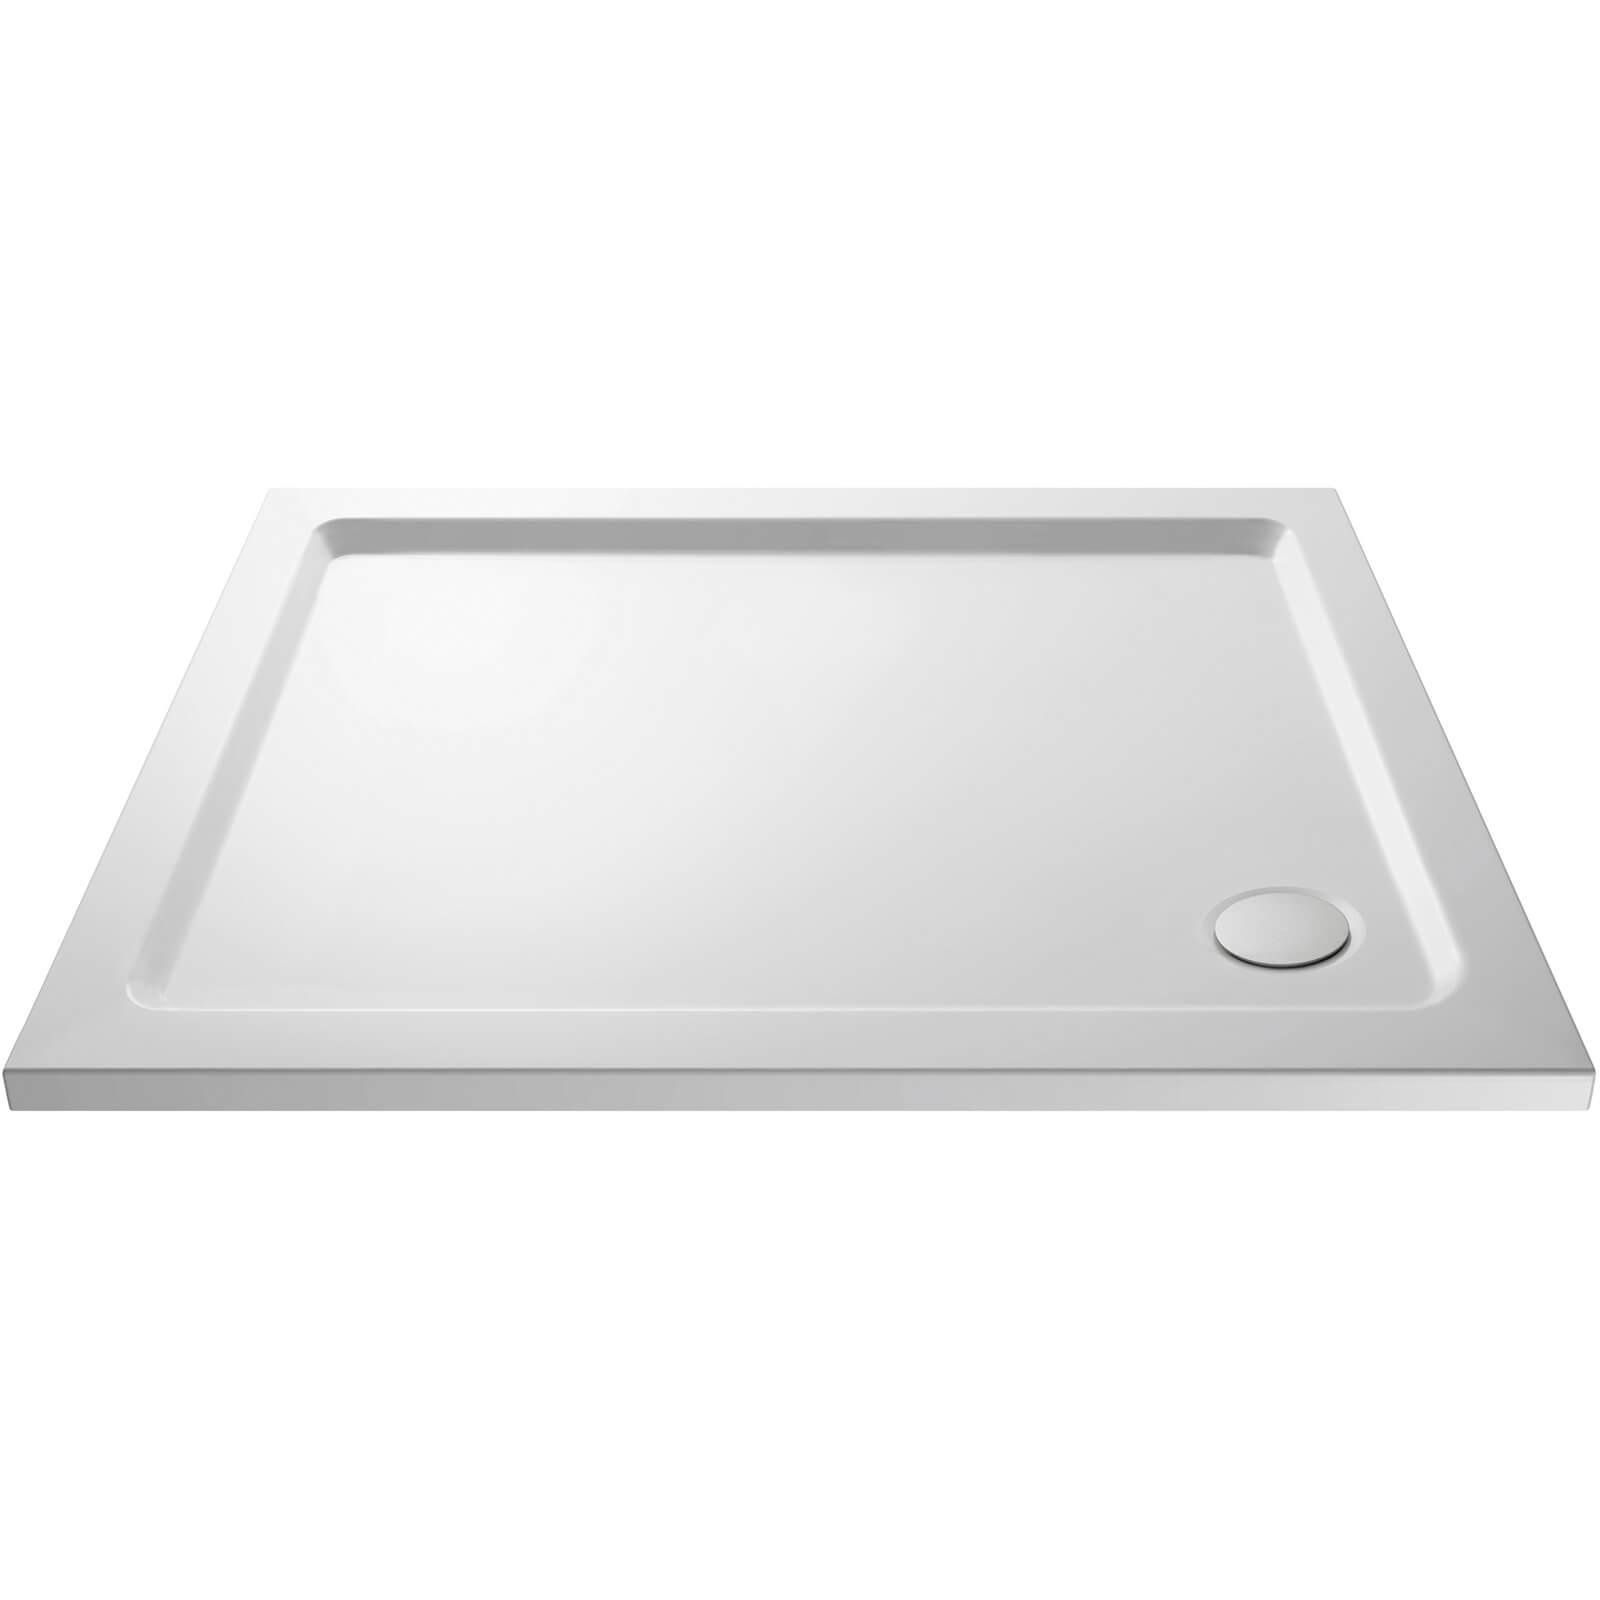 Balterley Rectangular Shower Tray - 900 x 800mm